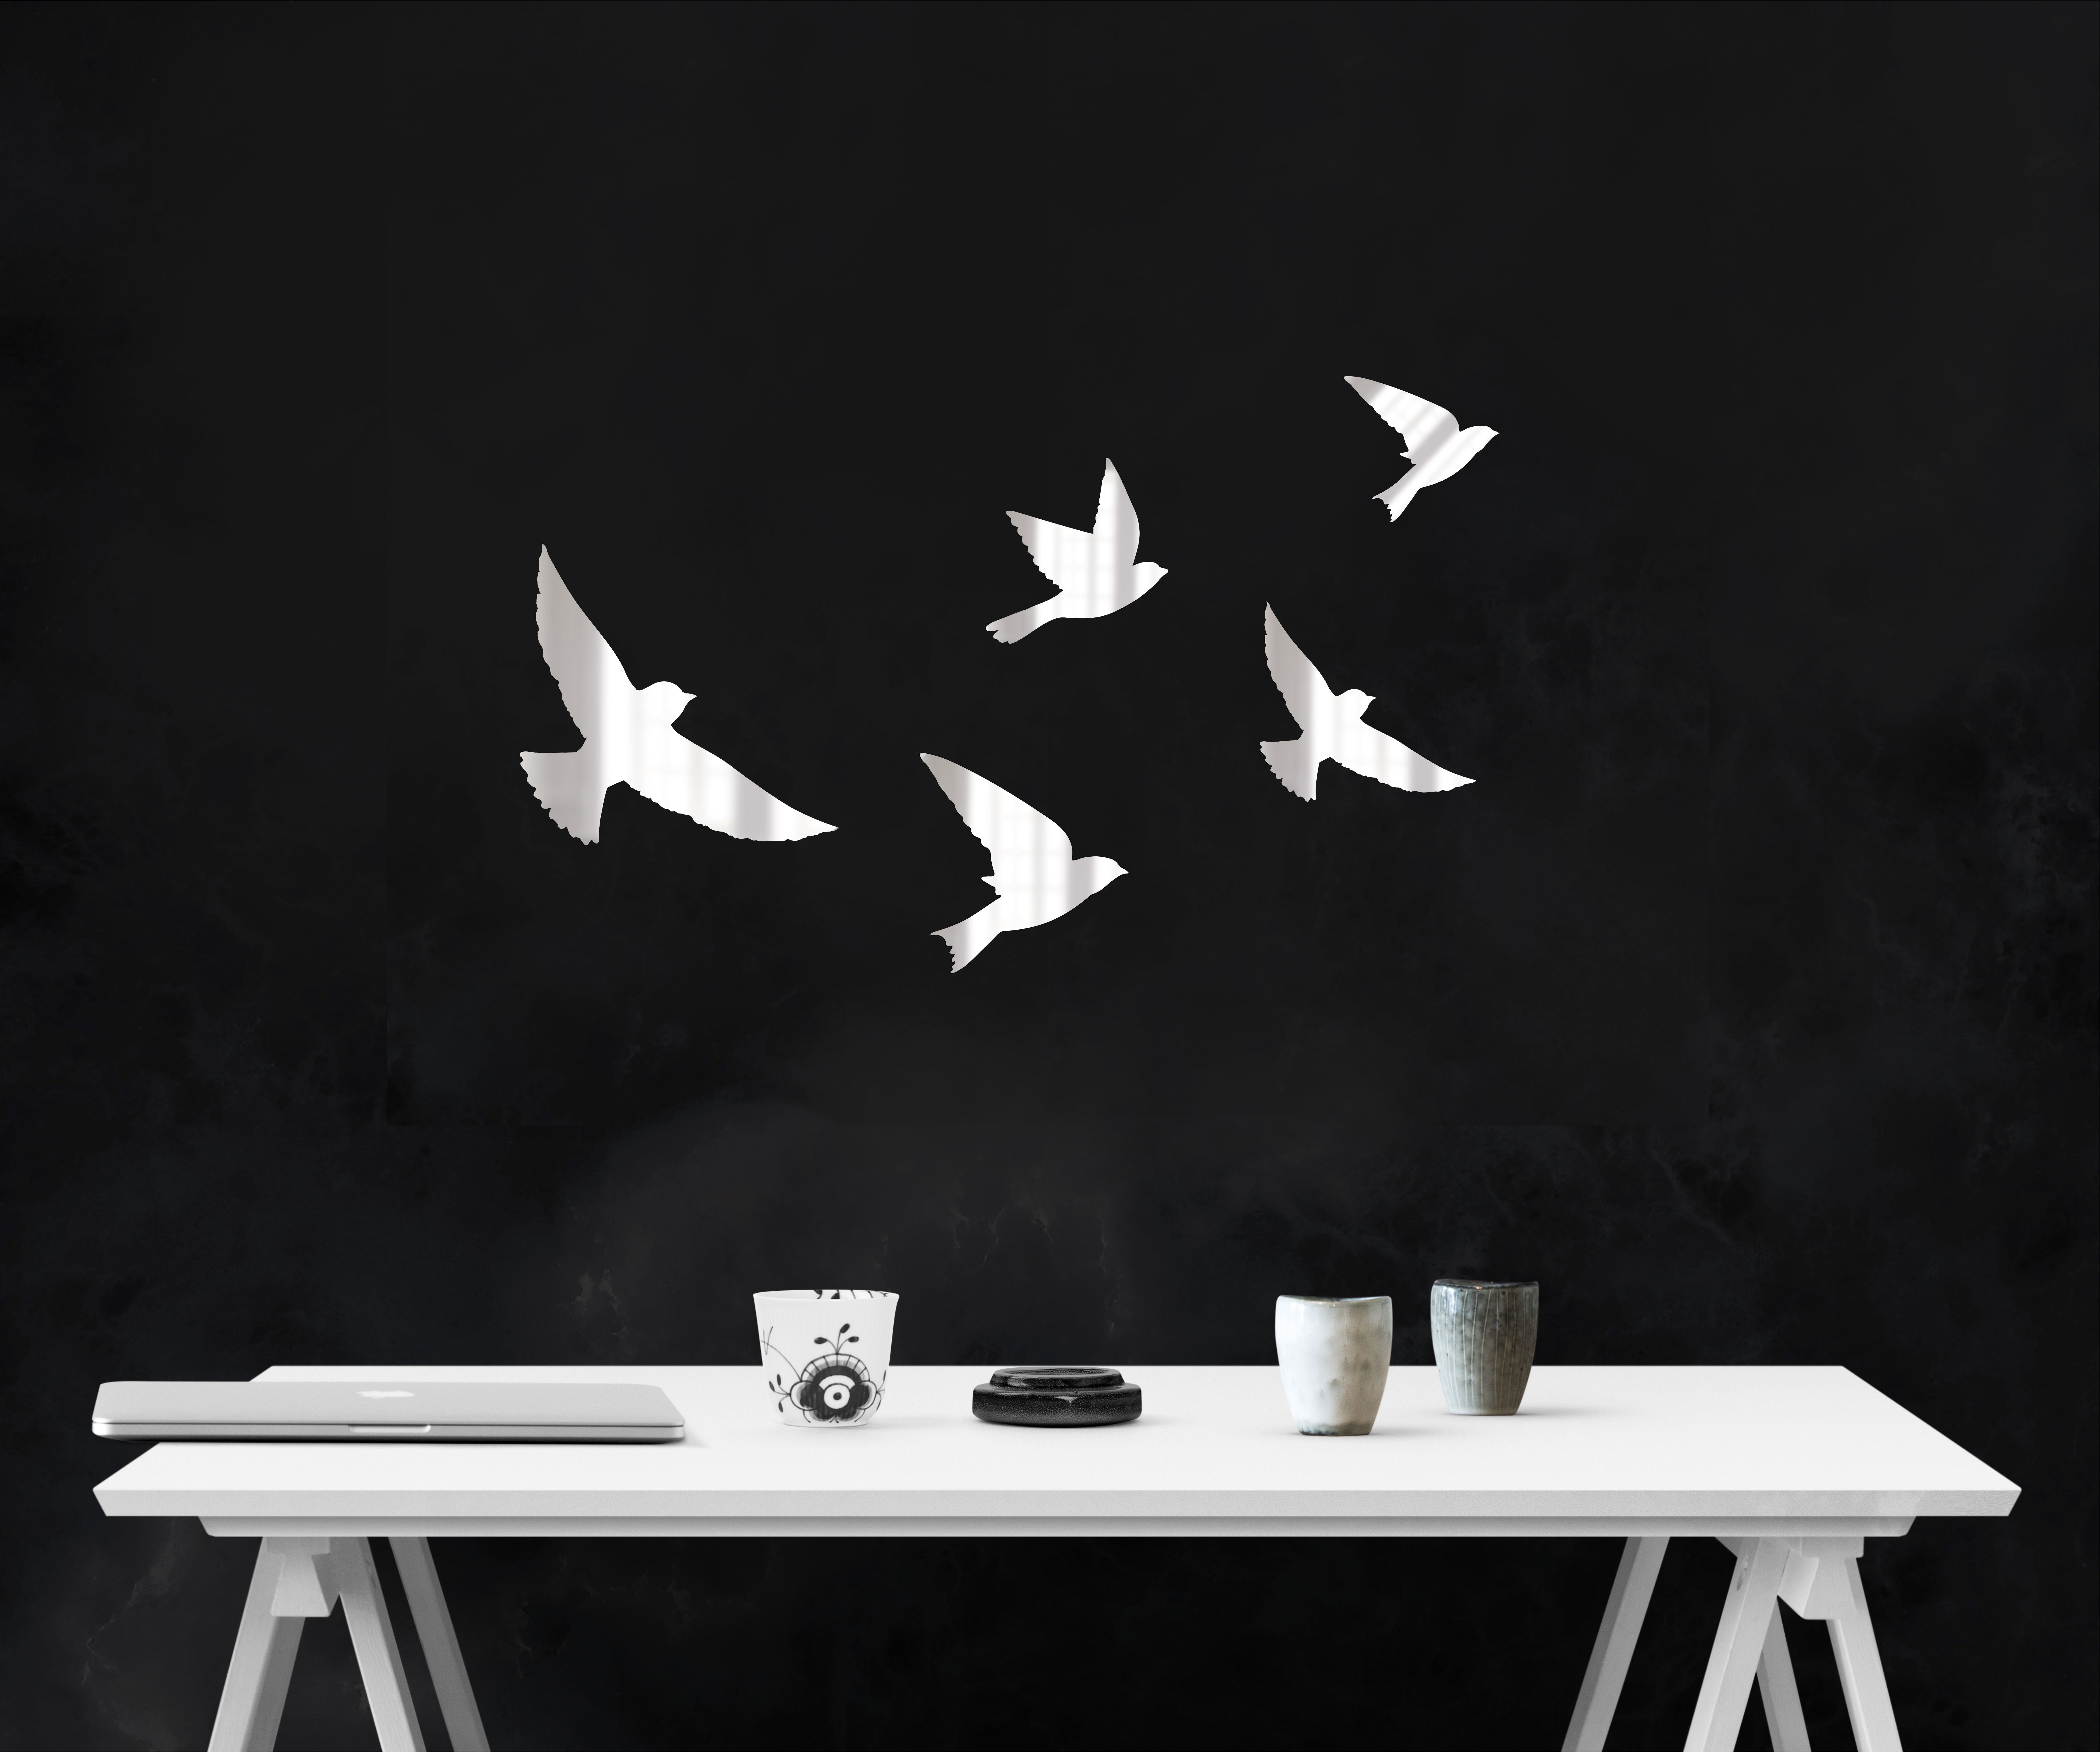 Украшение на стену Roomton Птицы, зеркало, декор на стену, Акрил